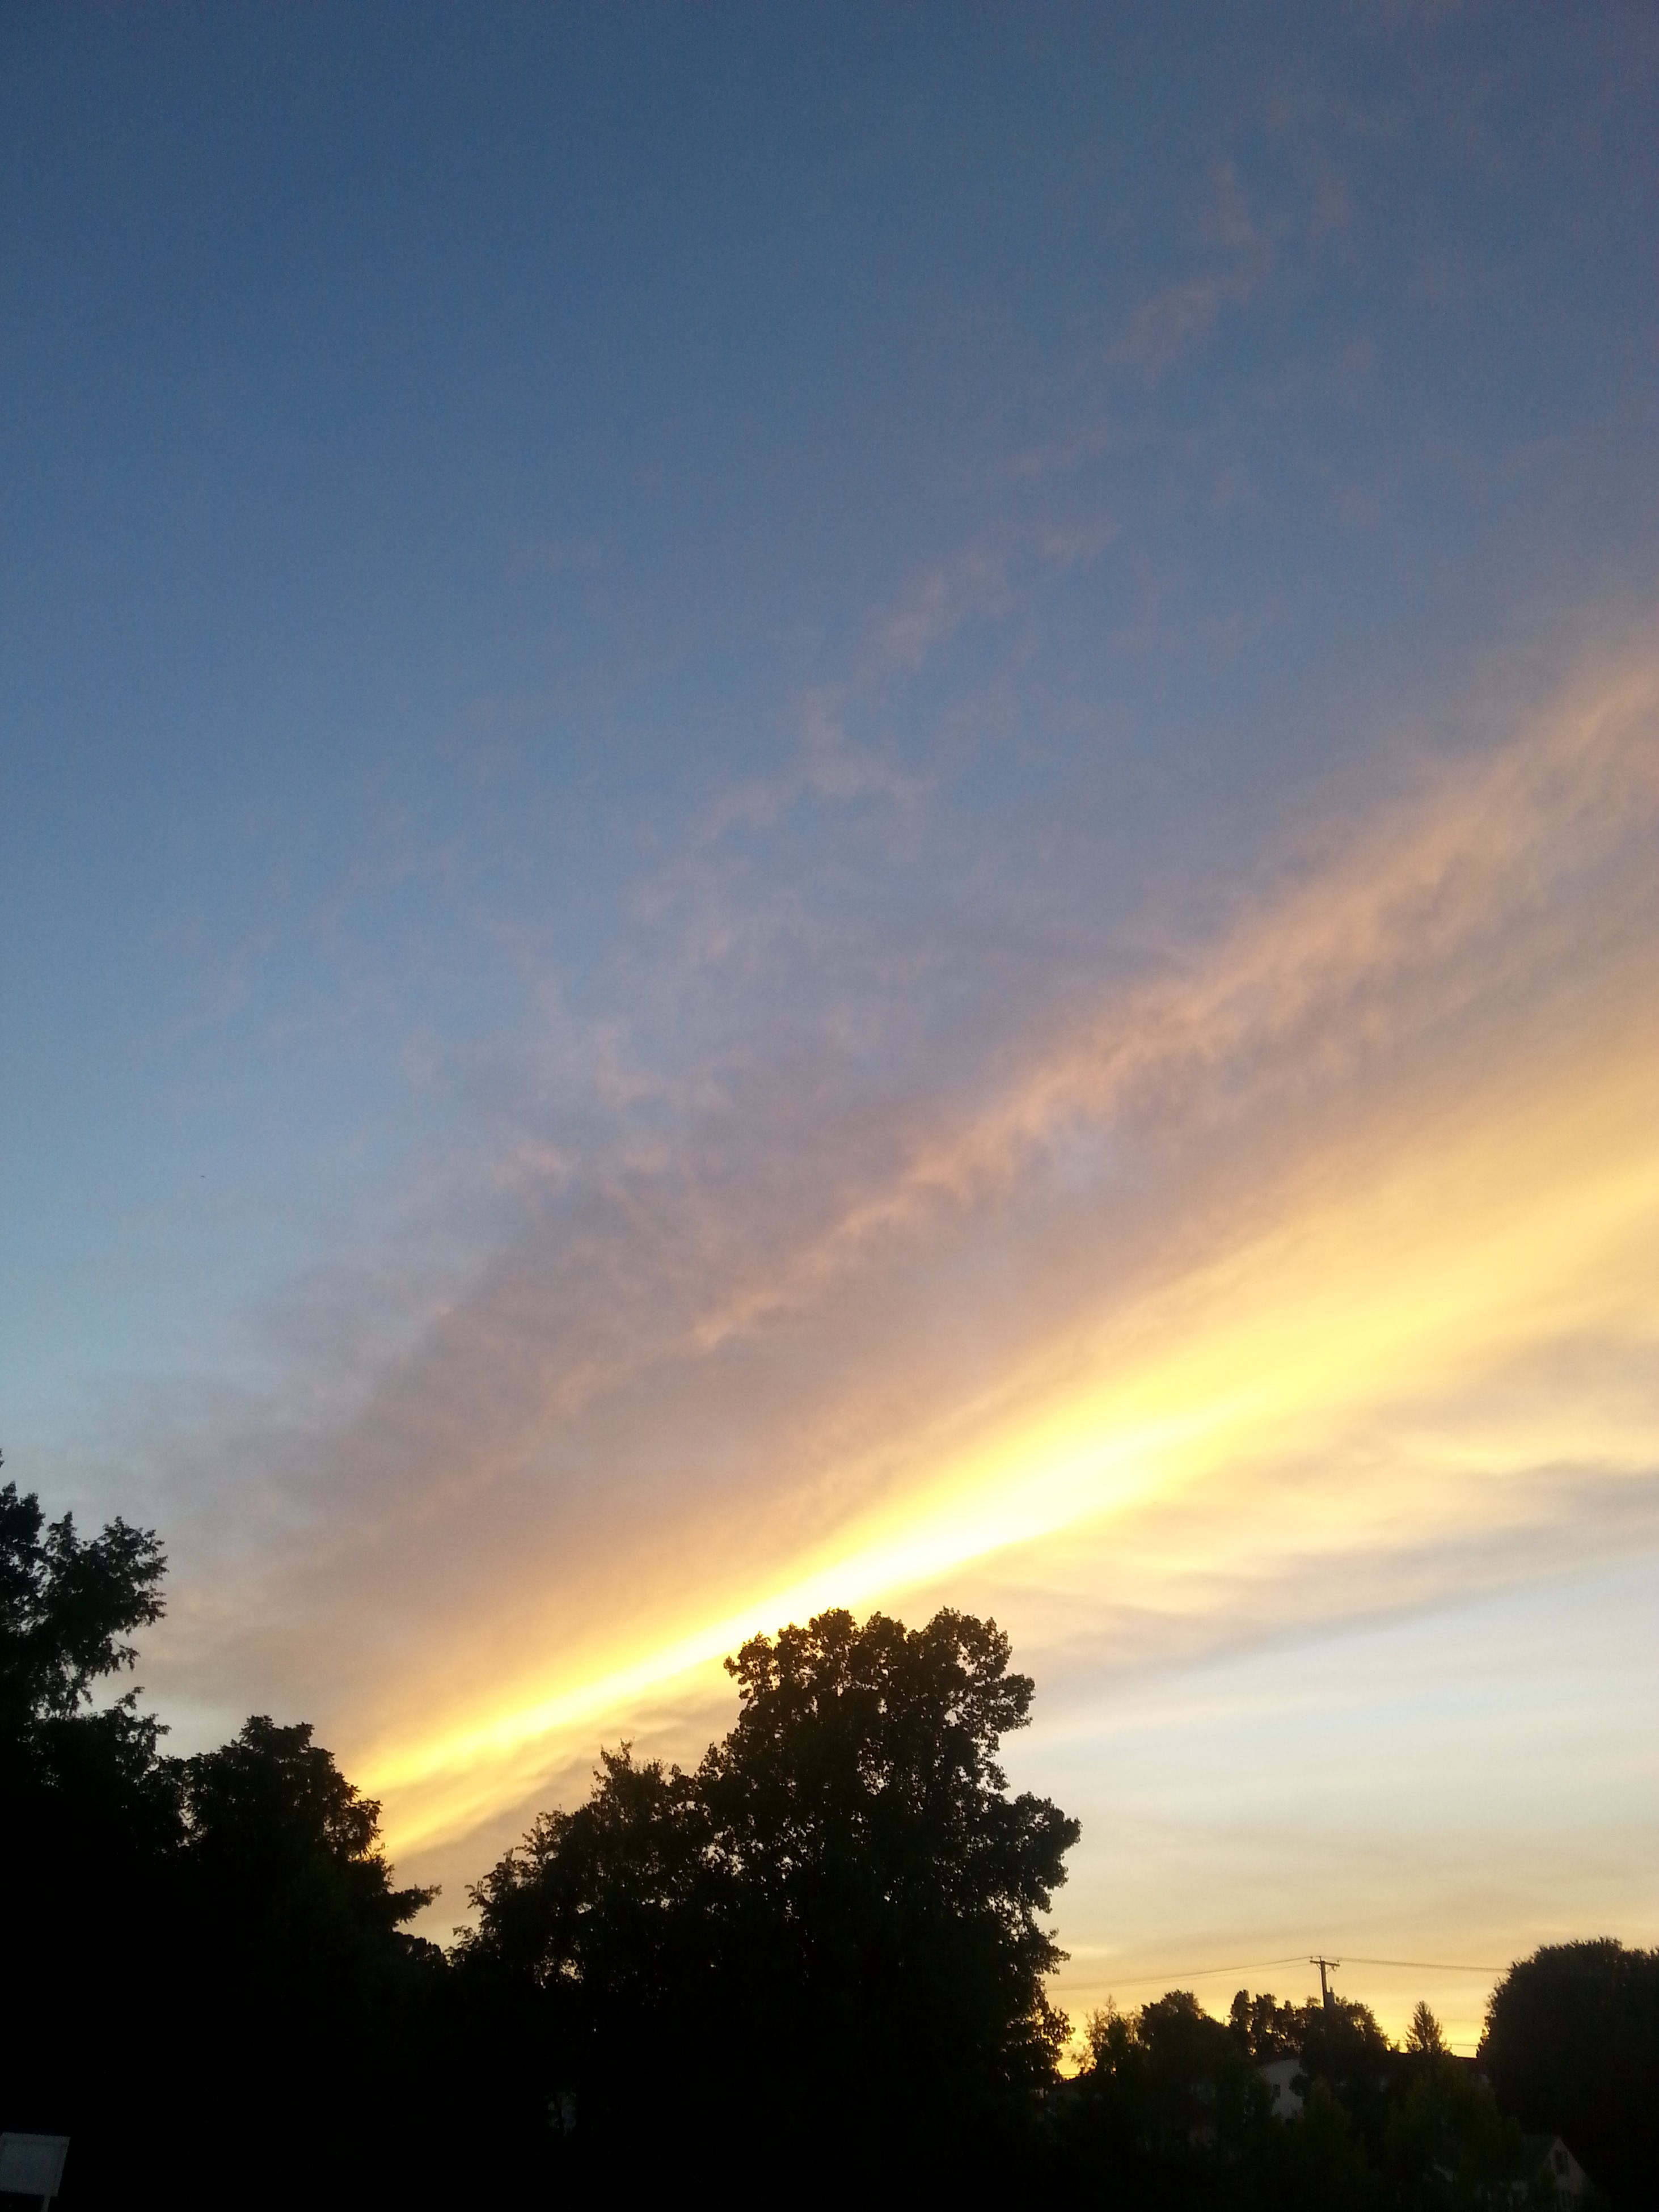 sunset, tree, silhouette, sky, beauty in nature, scenics, tranquility, orange color, tranquil scene, nature, idyllic, cloud - sky, growth, outdoors, no people, cloud, sun, non-urban scene, landscape, majestic, non urban scene, dark, blue